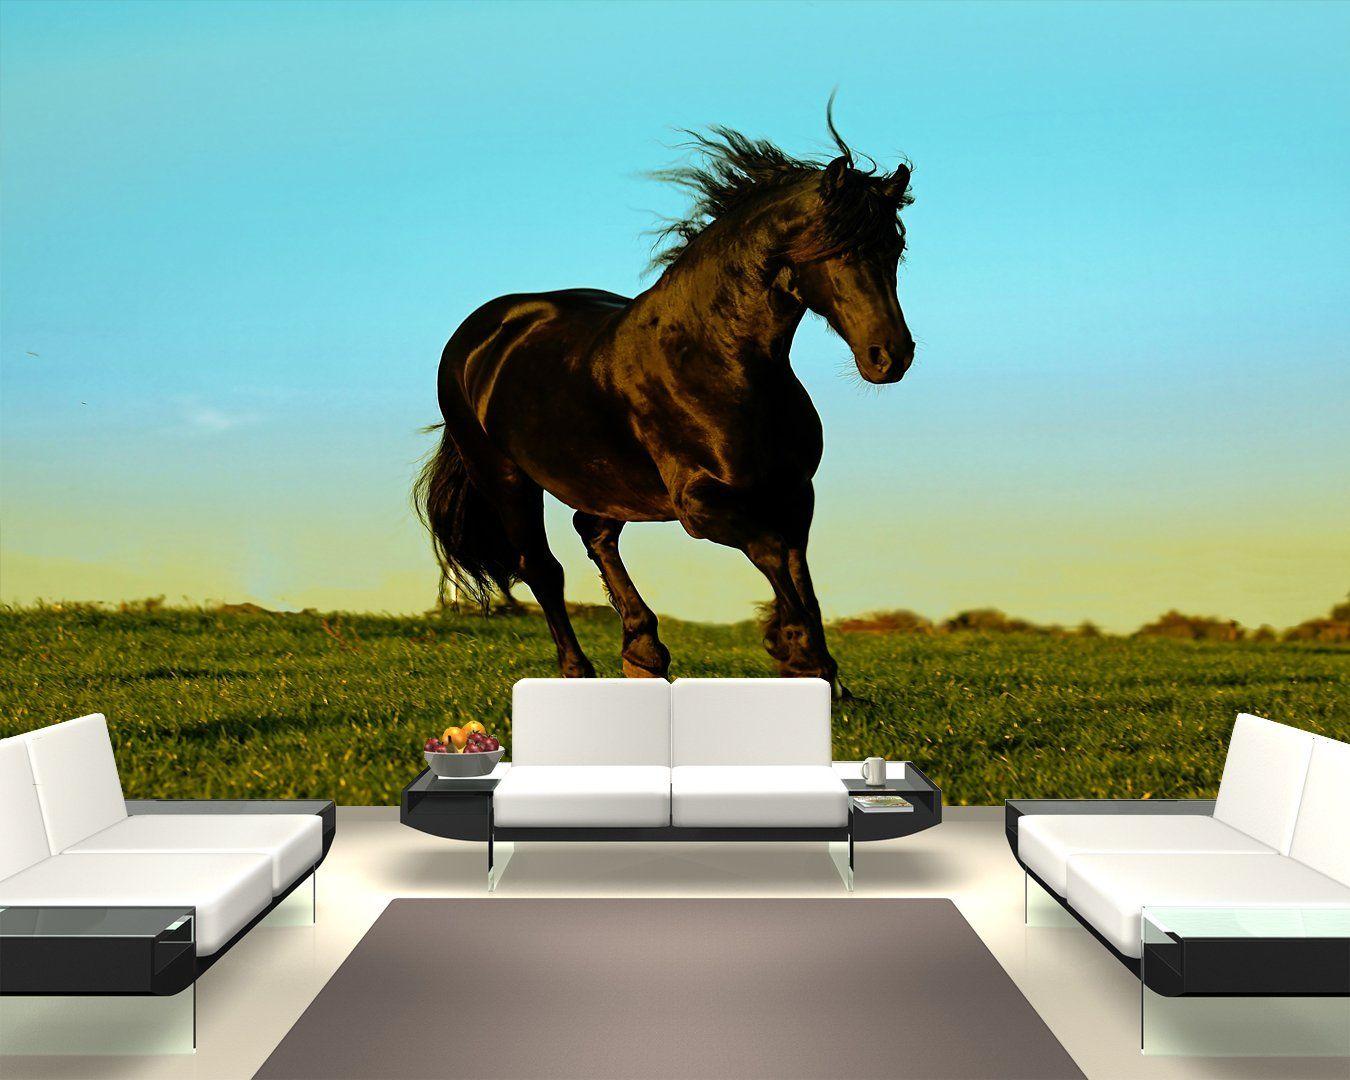 Fancy Bilderdepot selbstklebende Fototapete Pferd x cm direkt vom Hersteller Amazon de